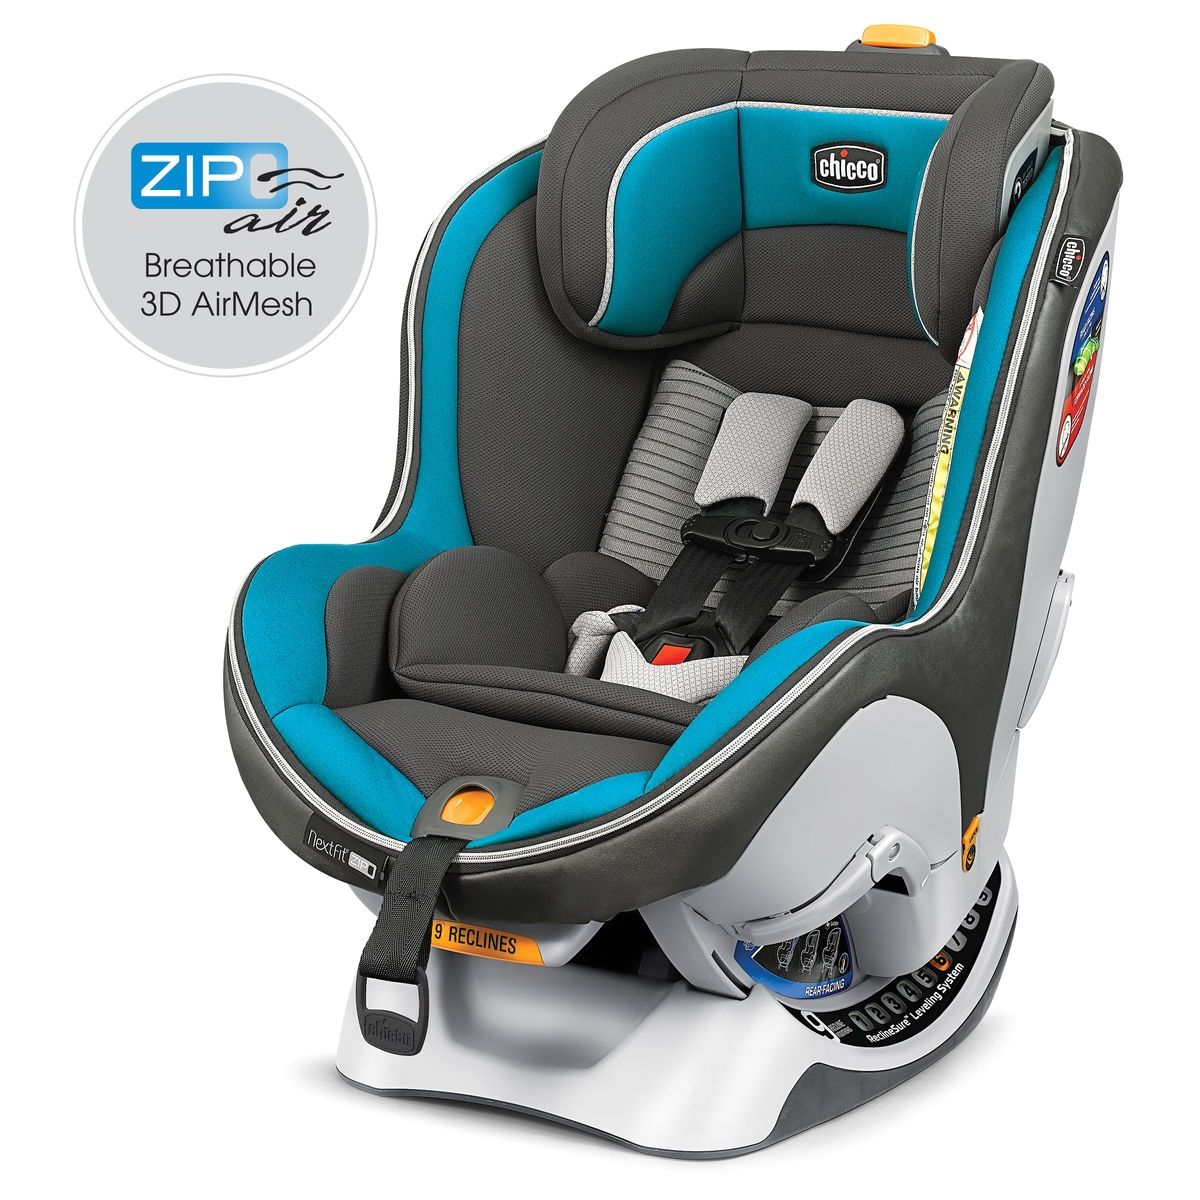 best rated convertible car seats, best convertible car